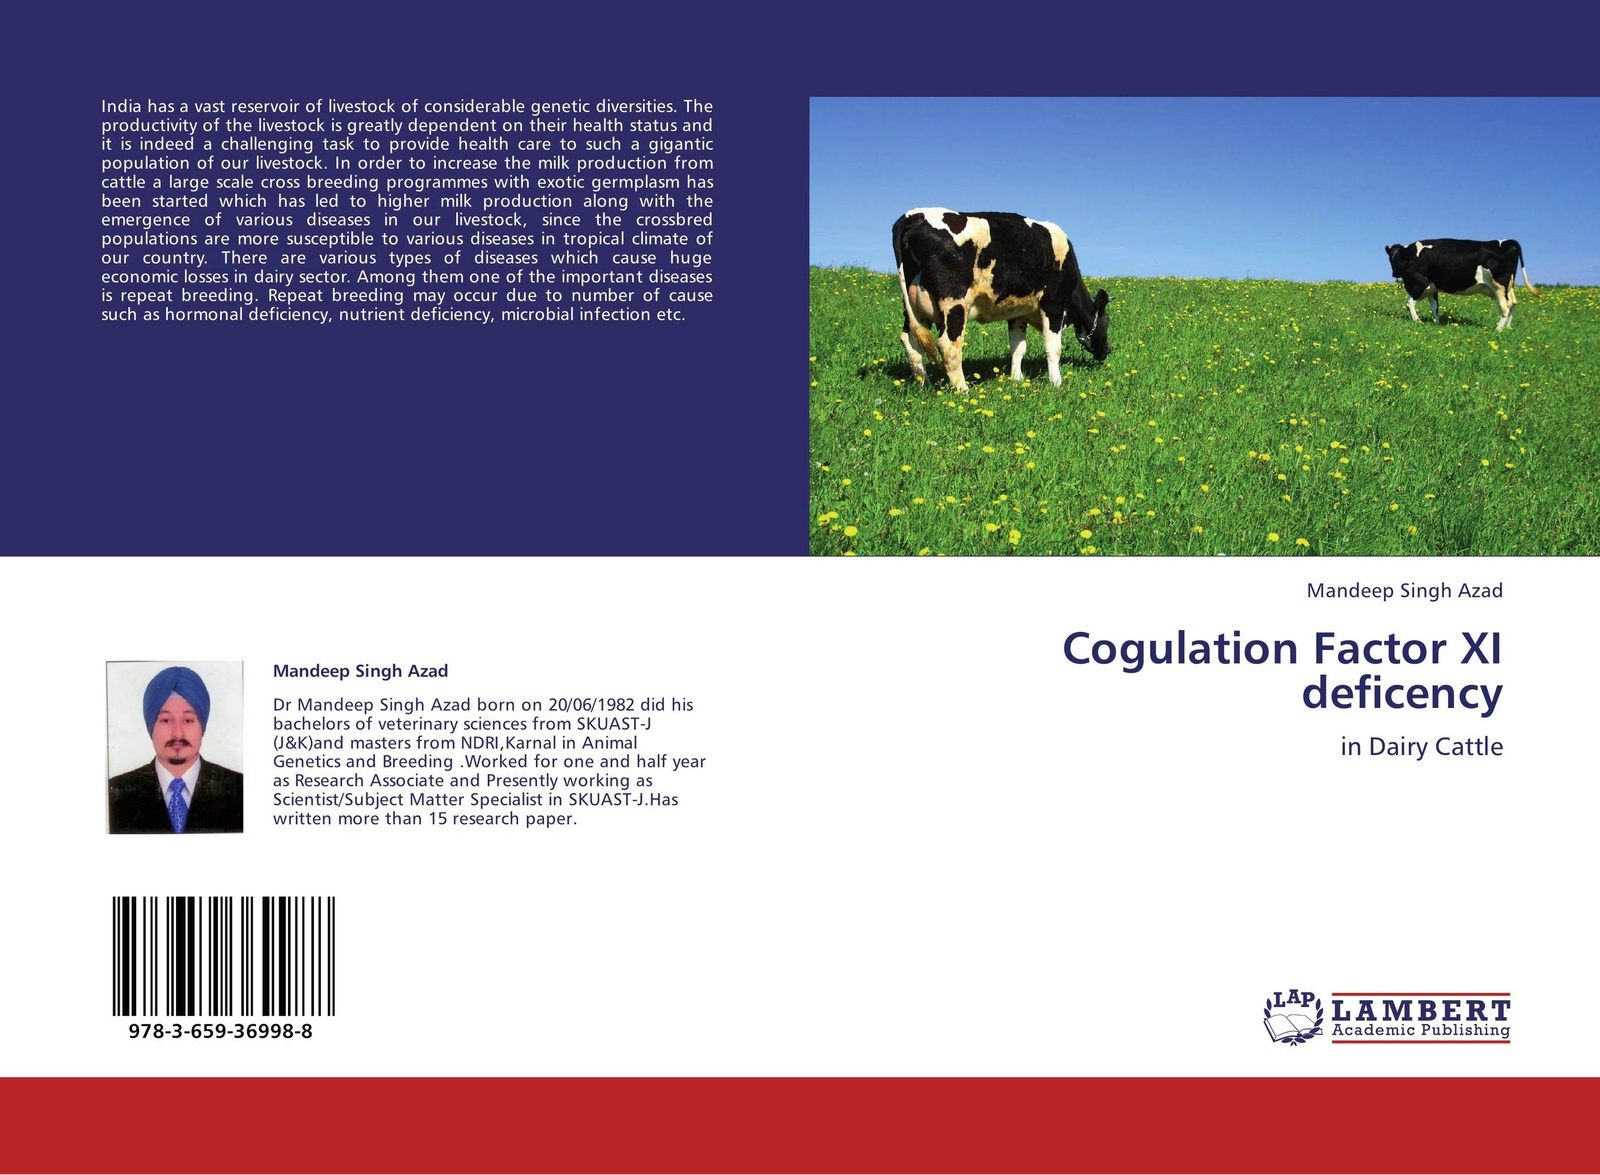 Mandeep Singh Azad Cogulation Factor XI deficency didanna habtamu lemma livestock production systems in the tropics